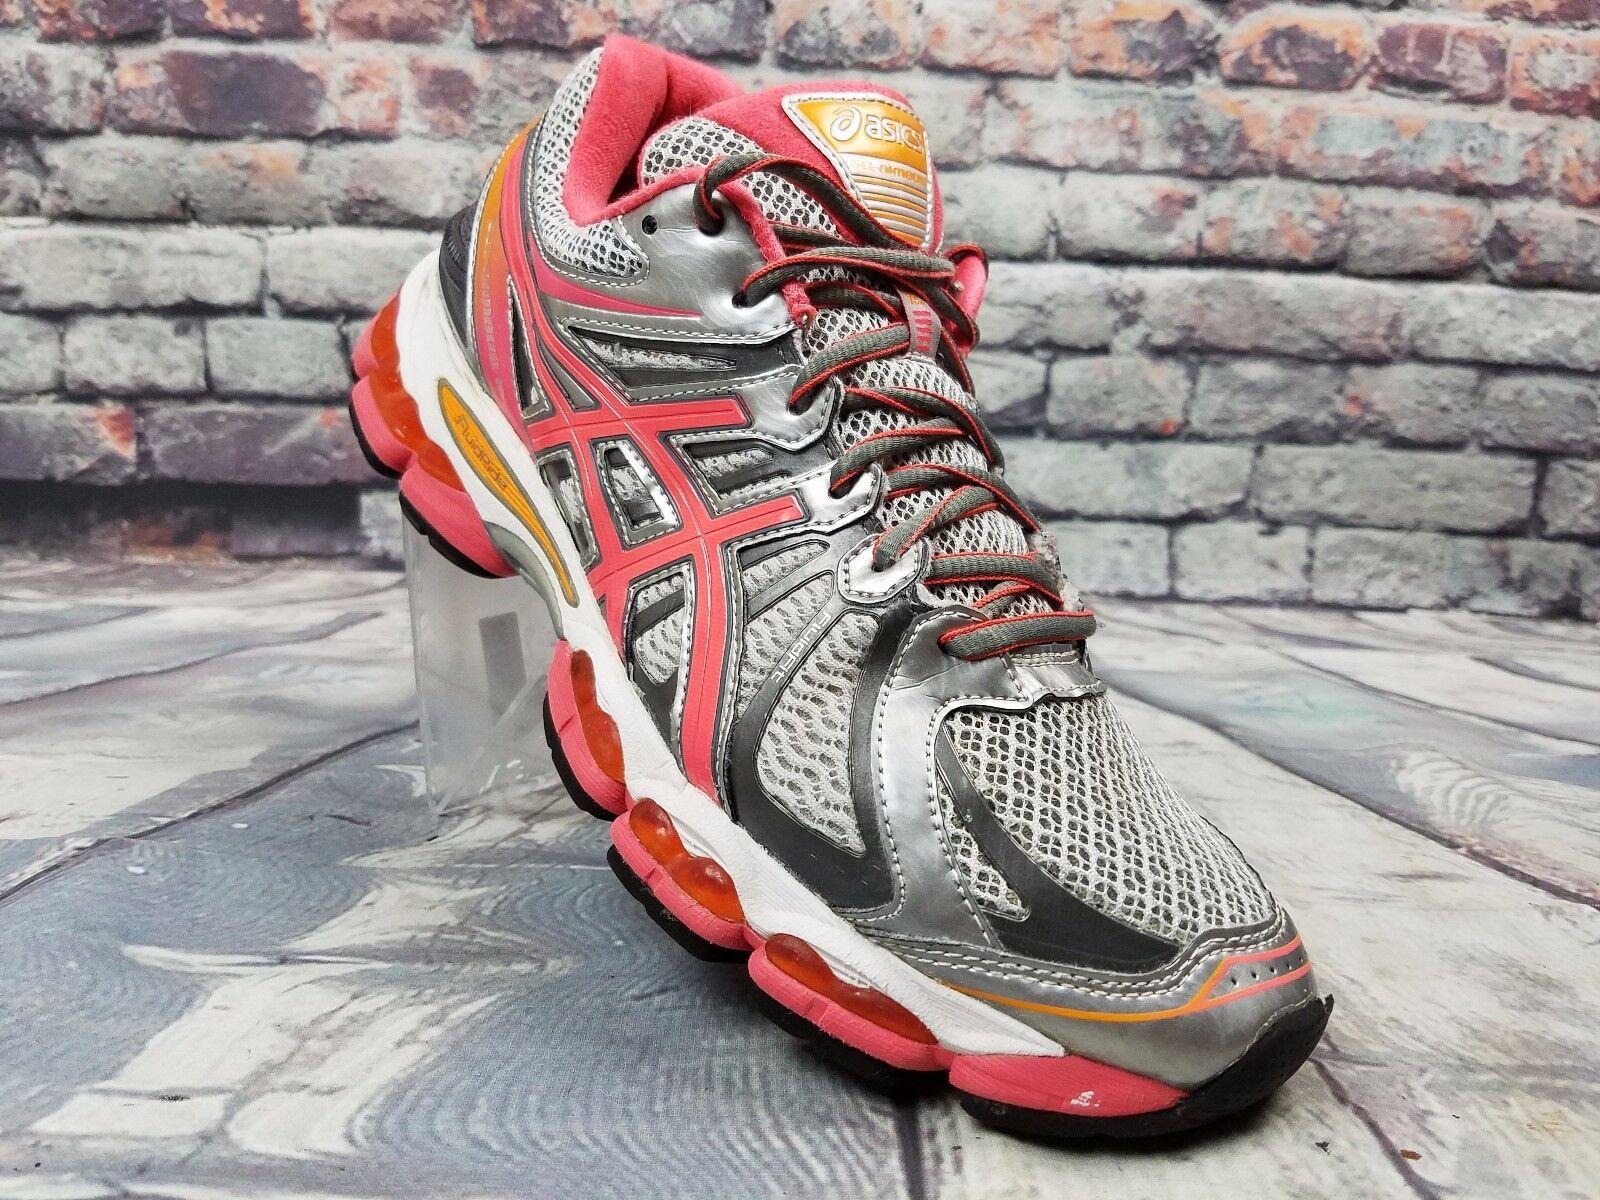 Women's Asics Gel Nimbu 15 (2A) Running shoes  Style T3B8N  la- W128 Size 11